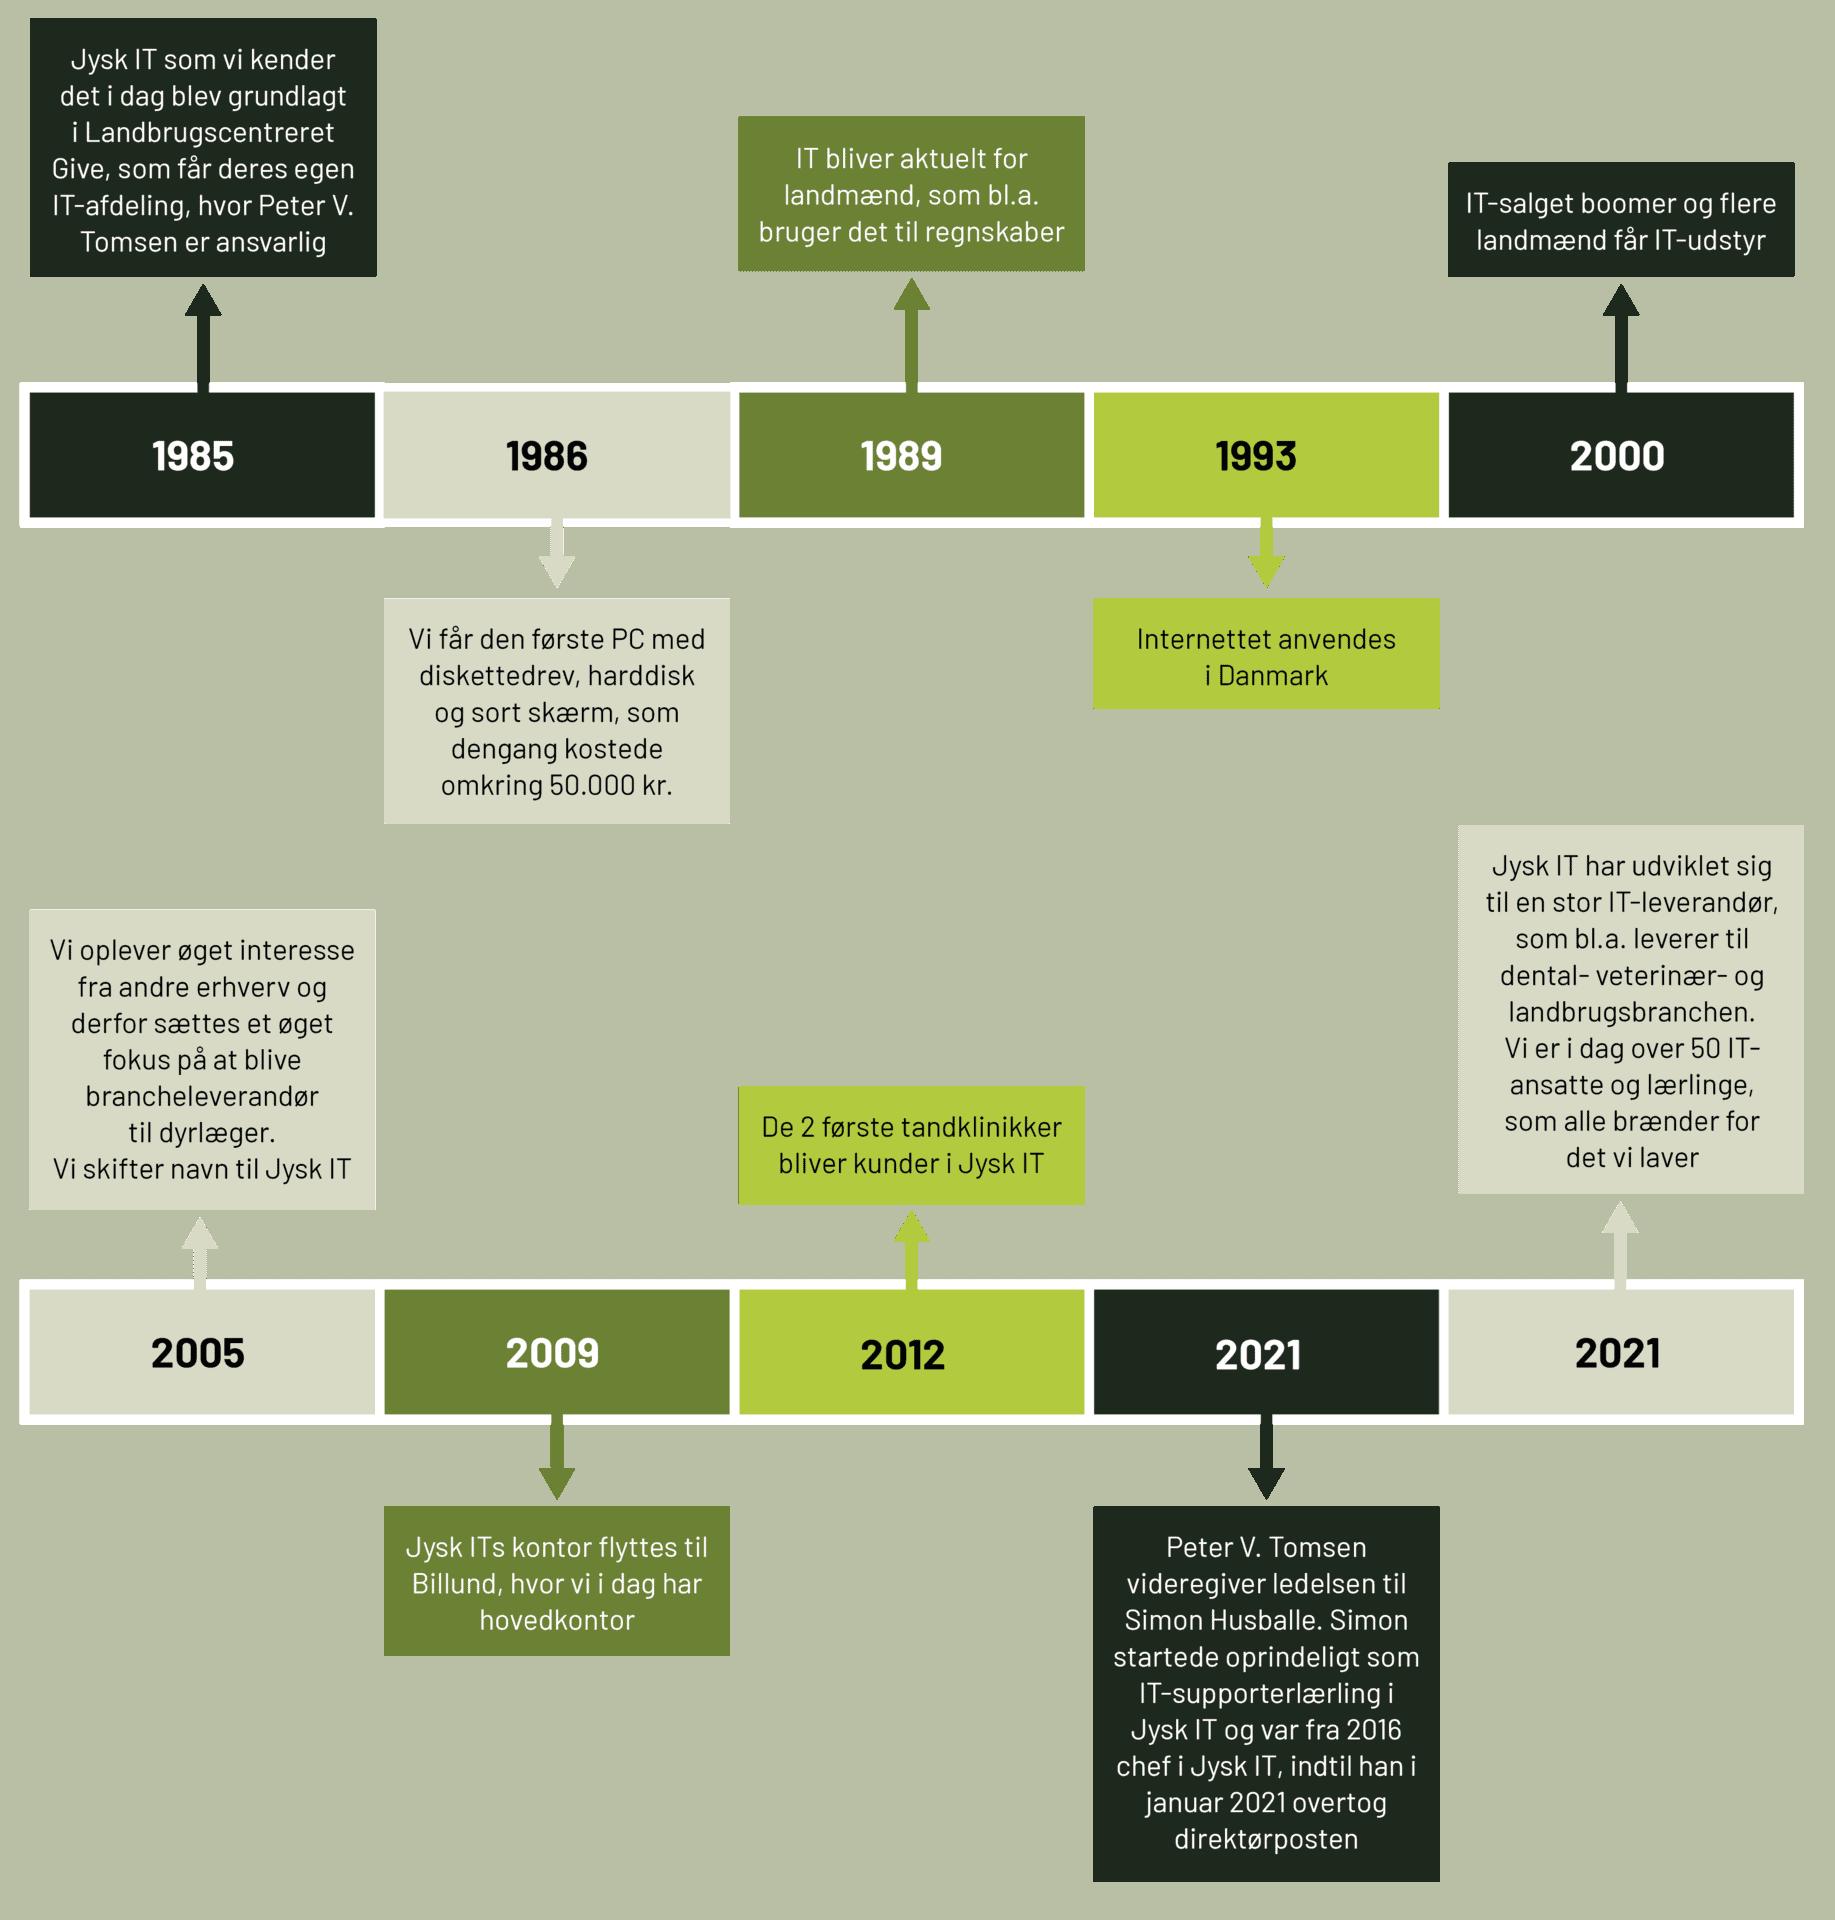 Jysk ITs historie